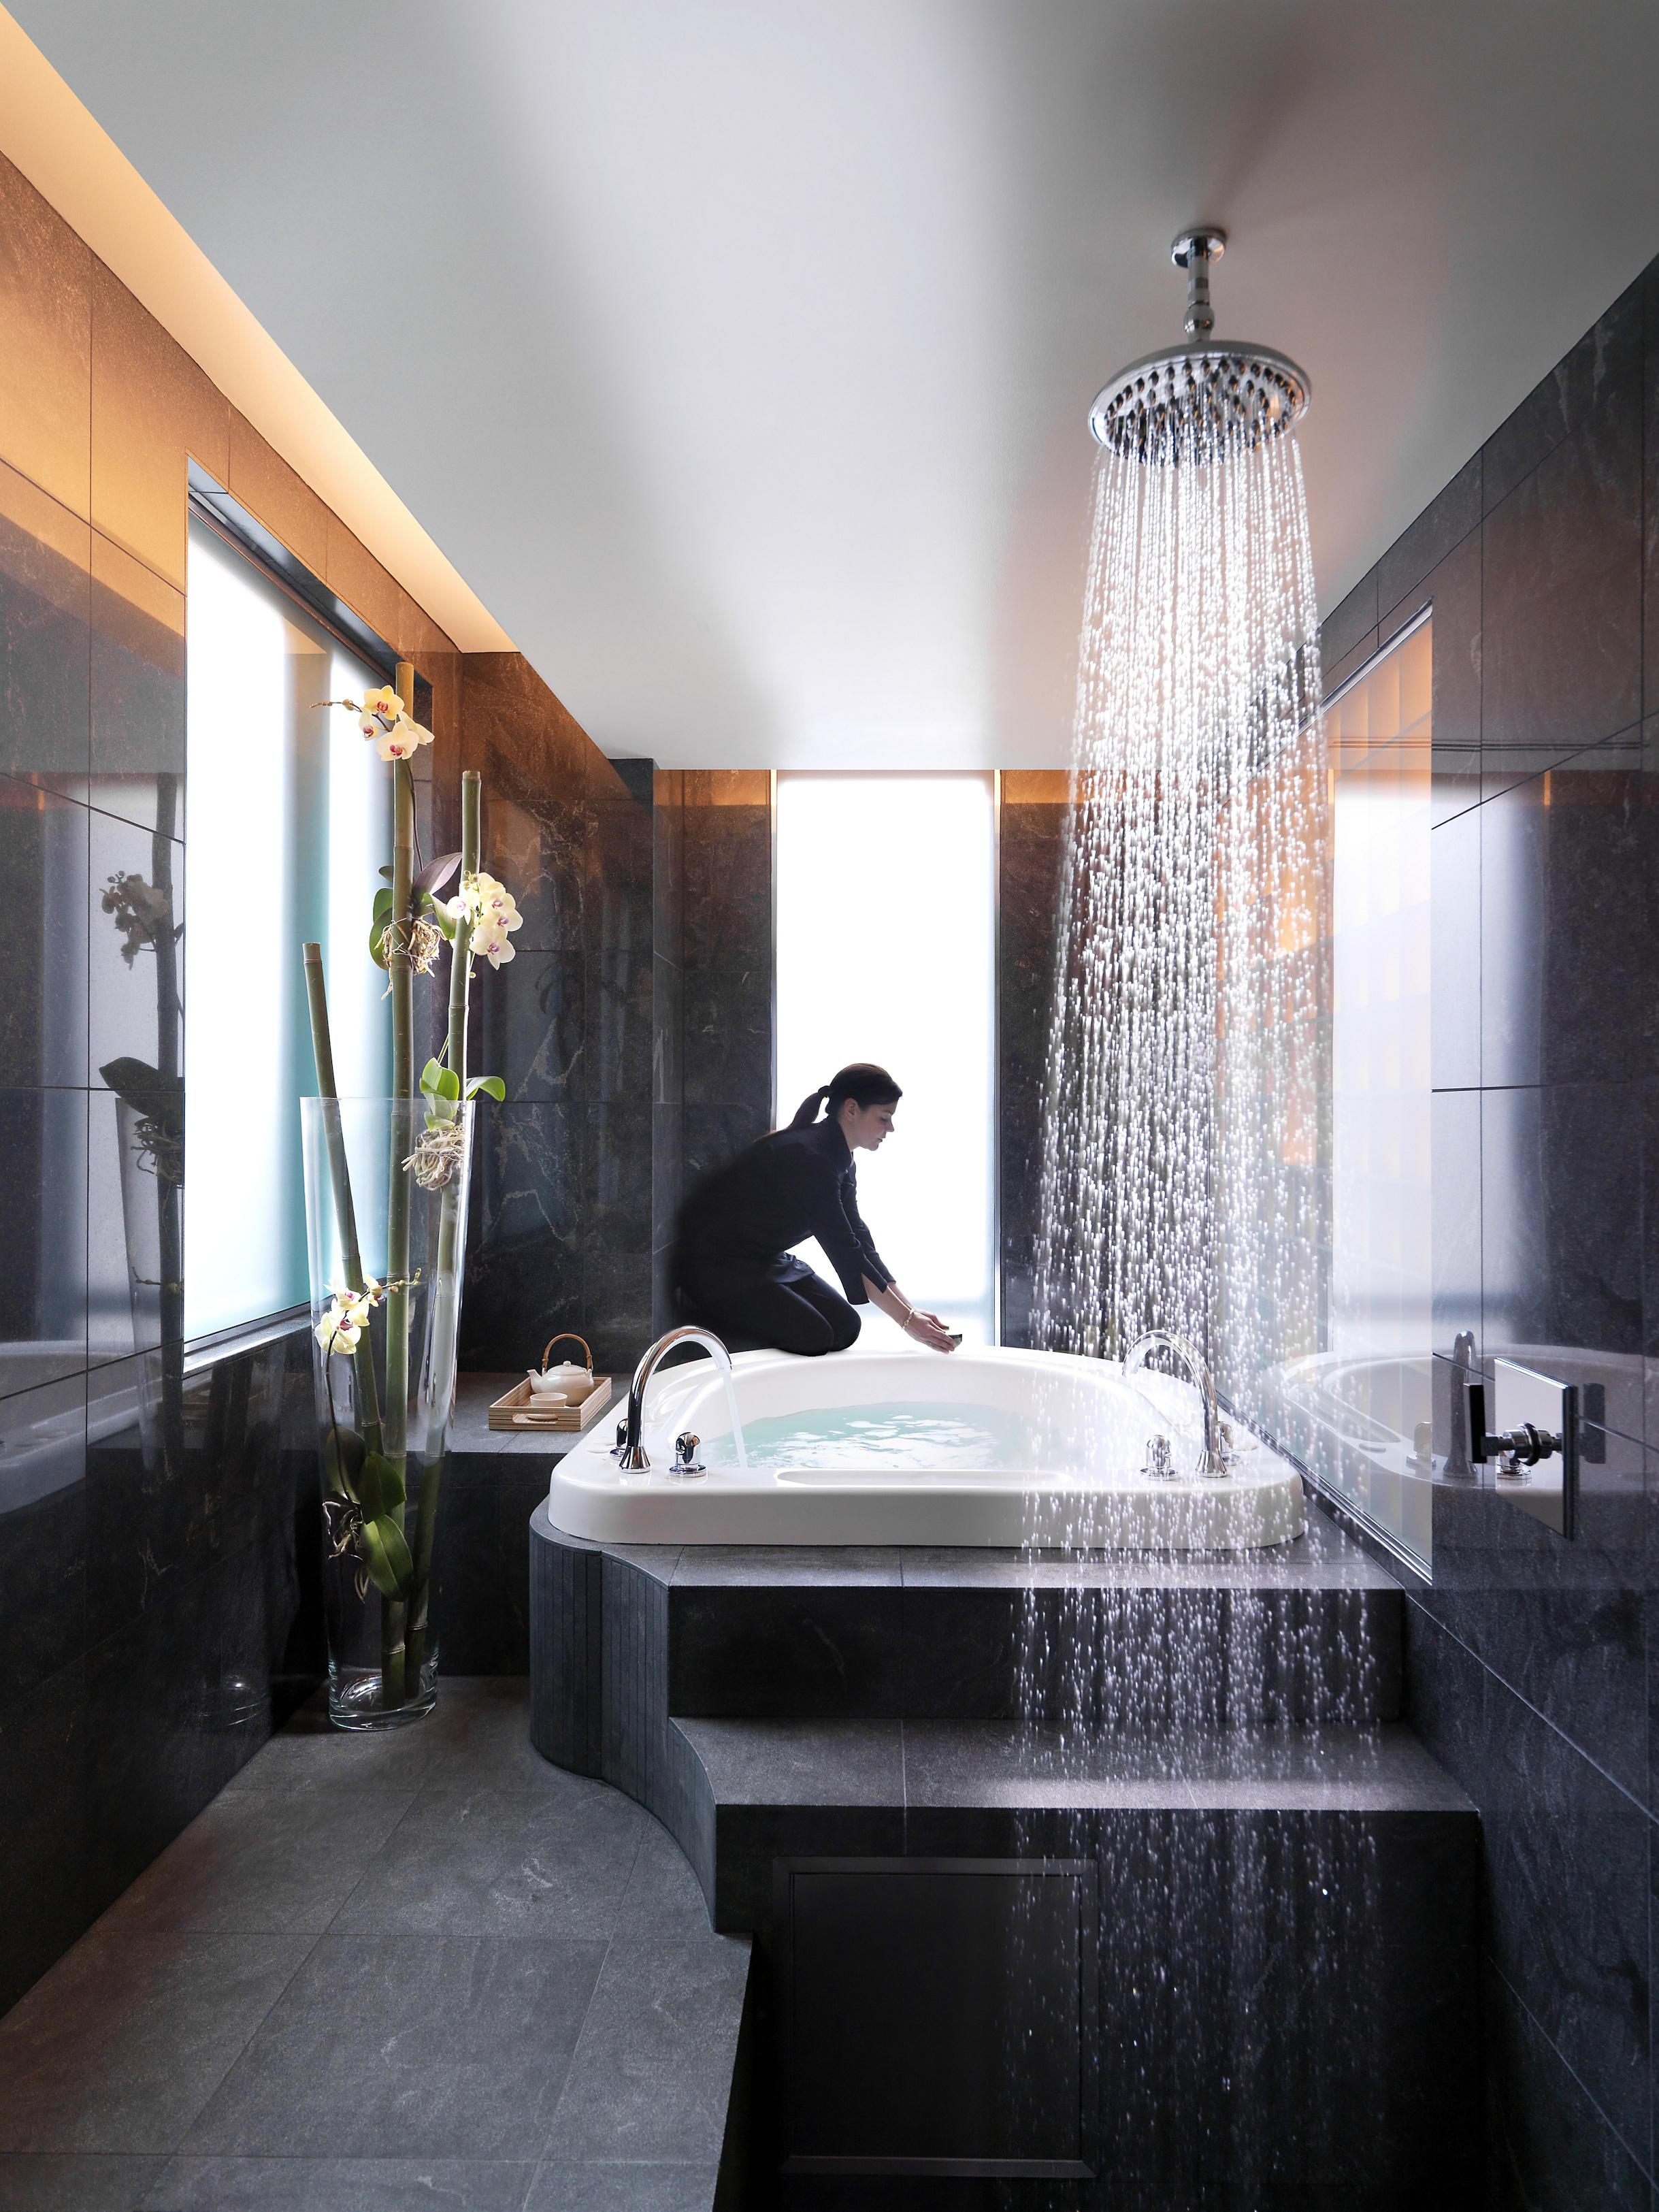 boston-spa-bath-preparation